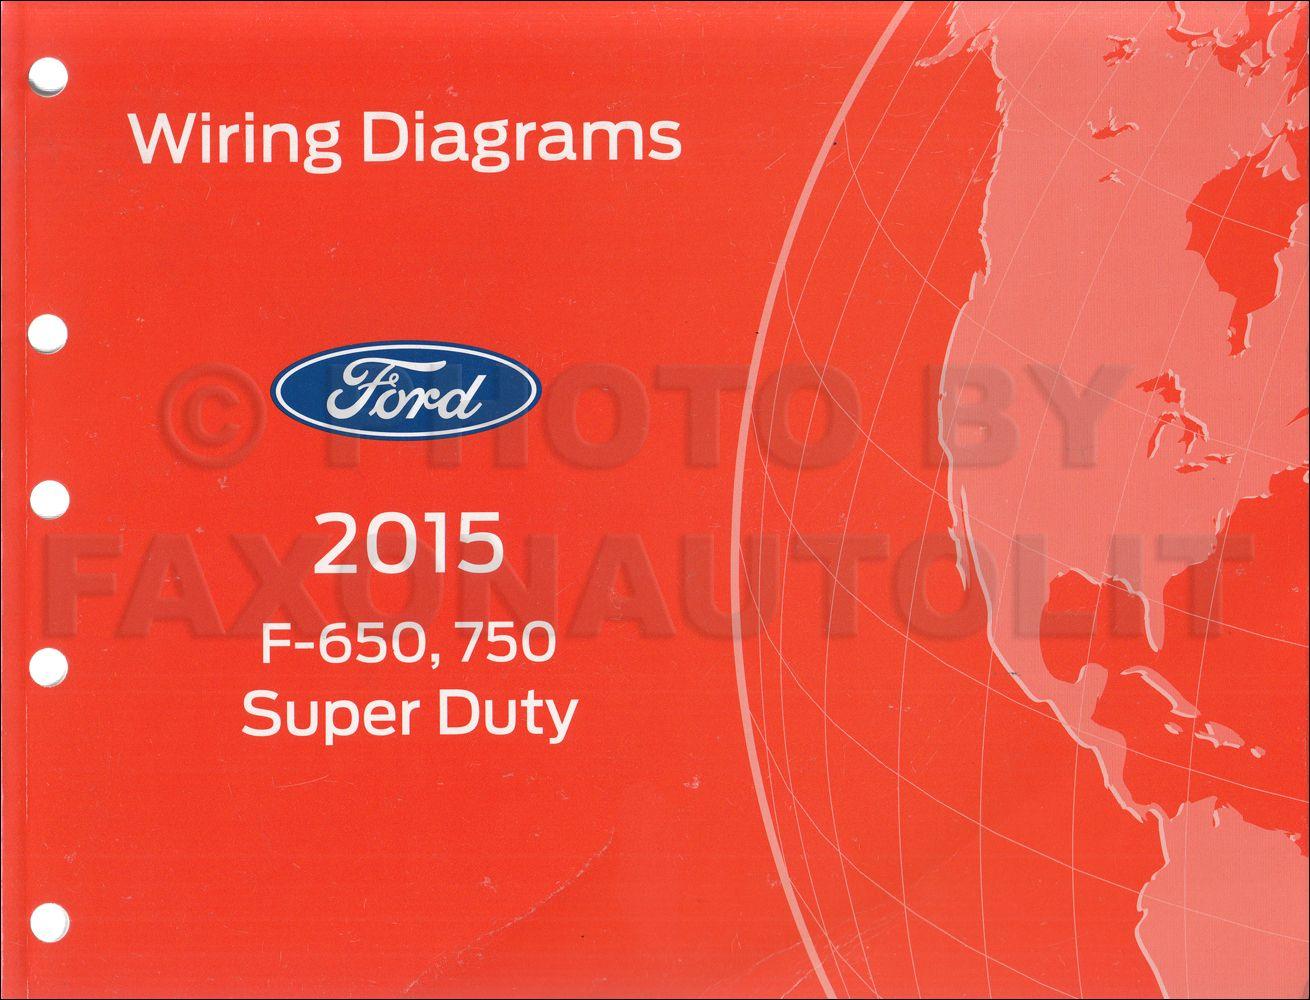 Ford F650 Headlight Wiring - Wiring Diagram M2 F Headlight Wiring Schematic on